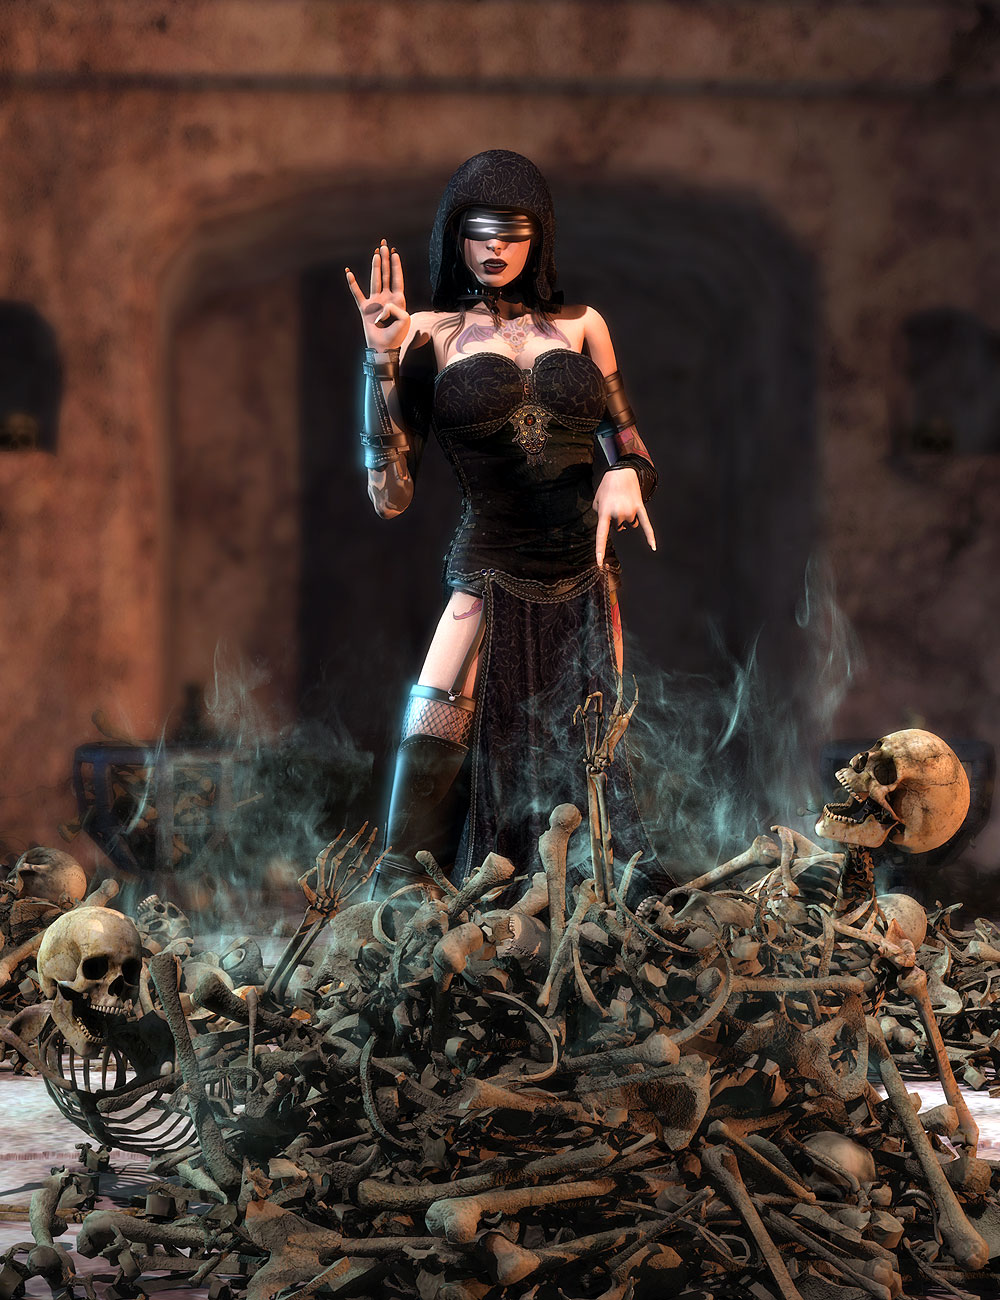 More of Them Bones by: Orestes Graphics, 3D Models by Daz 3D